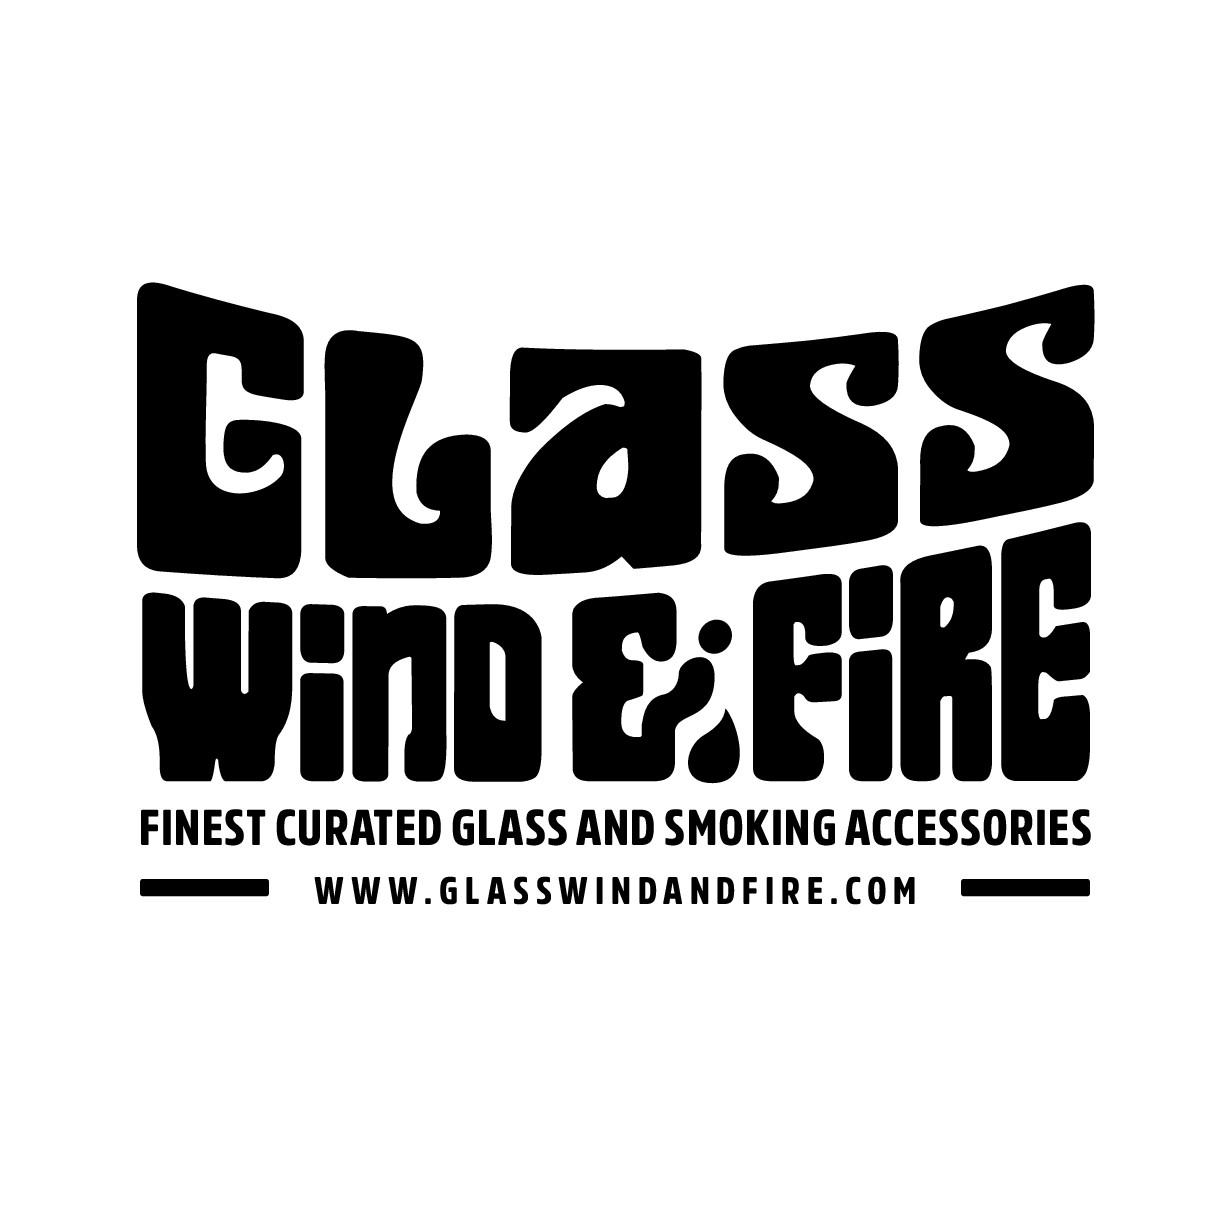 Add website to logo